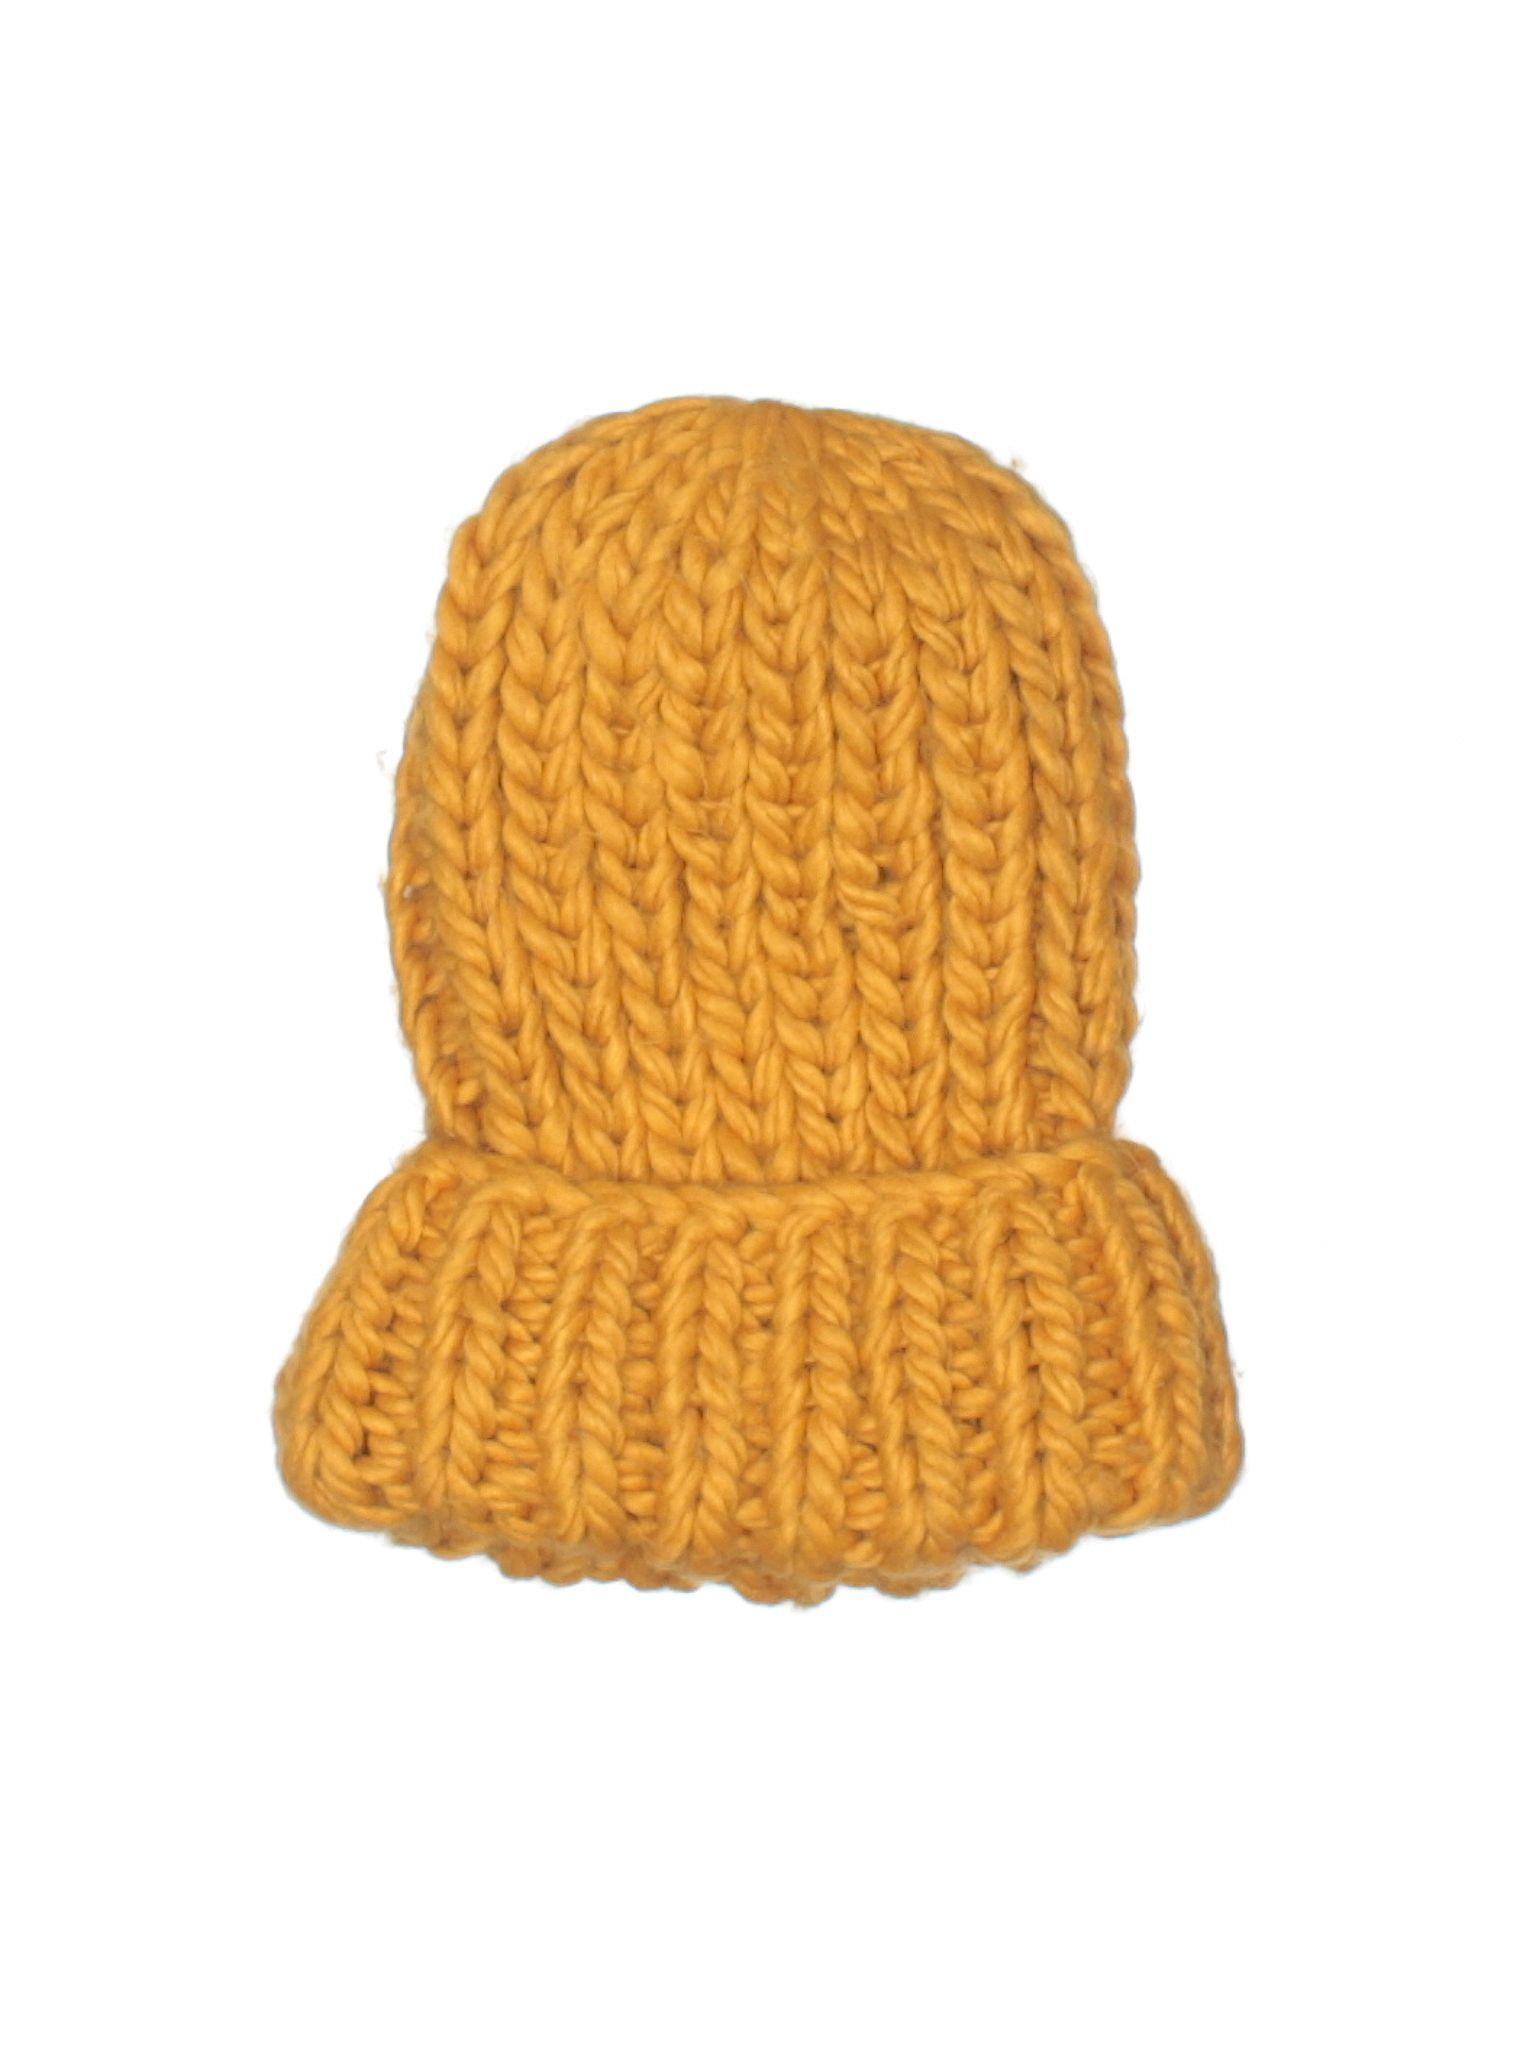 Zara Beanie  Size 0.00 Dark Yellow Women s Accessories -  13.99 ... 62b11640280